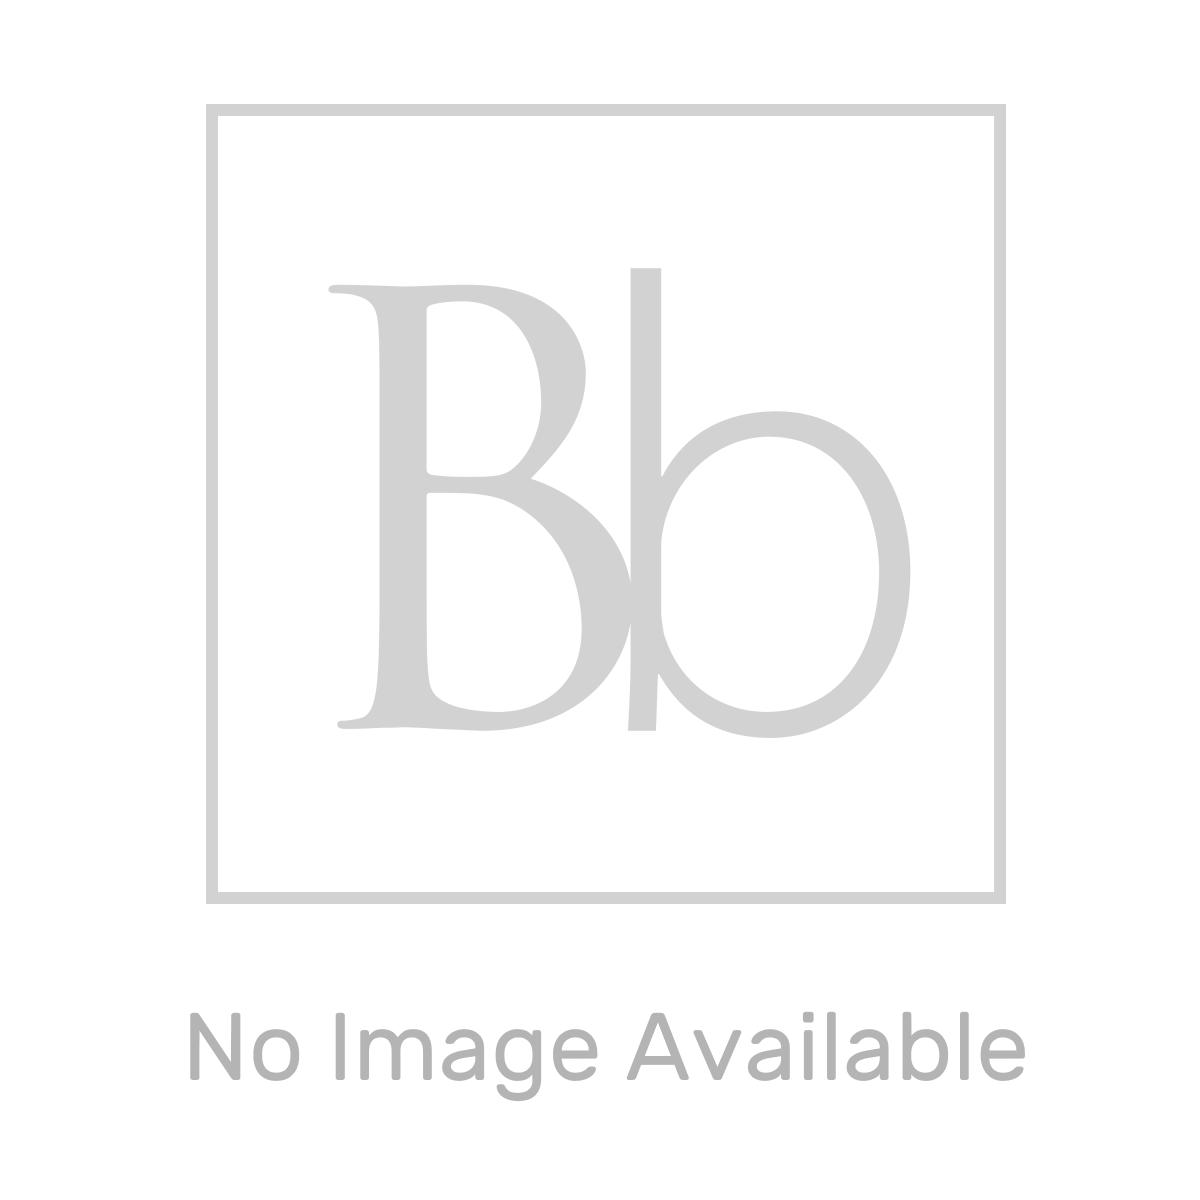 Bath waste plug and chain diagram EA329